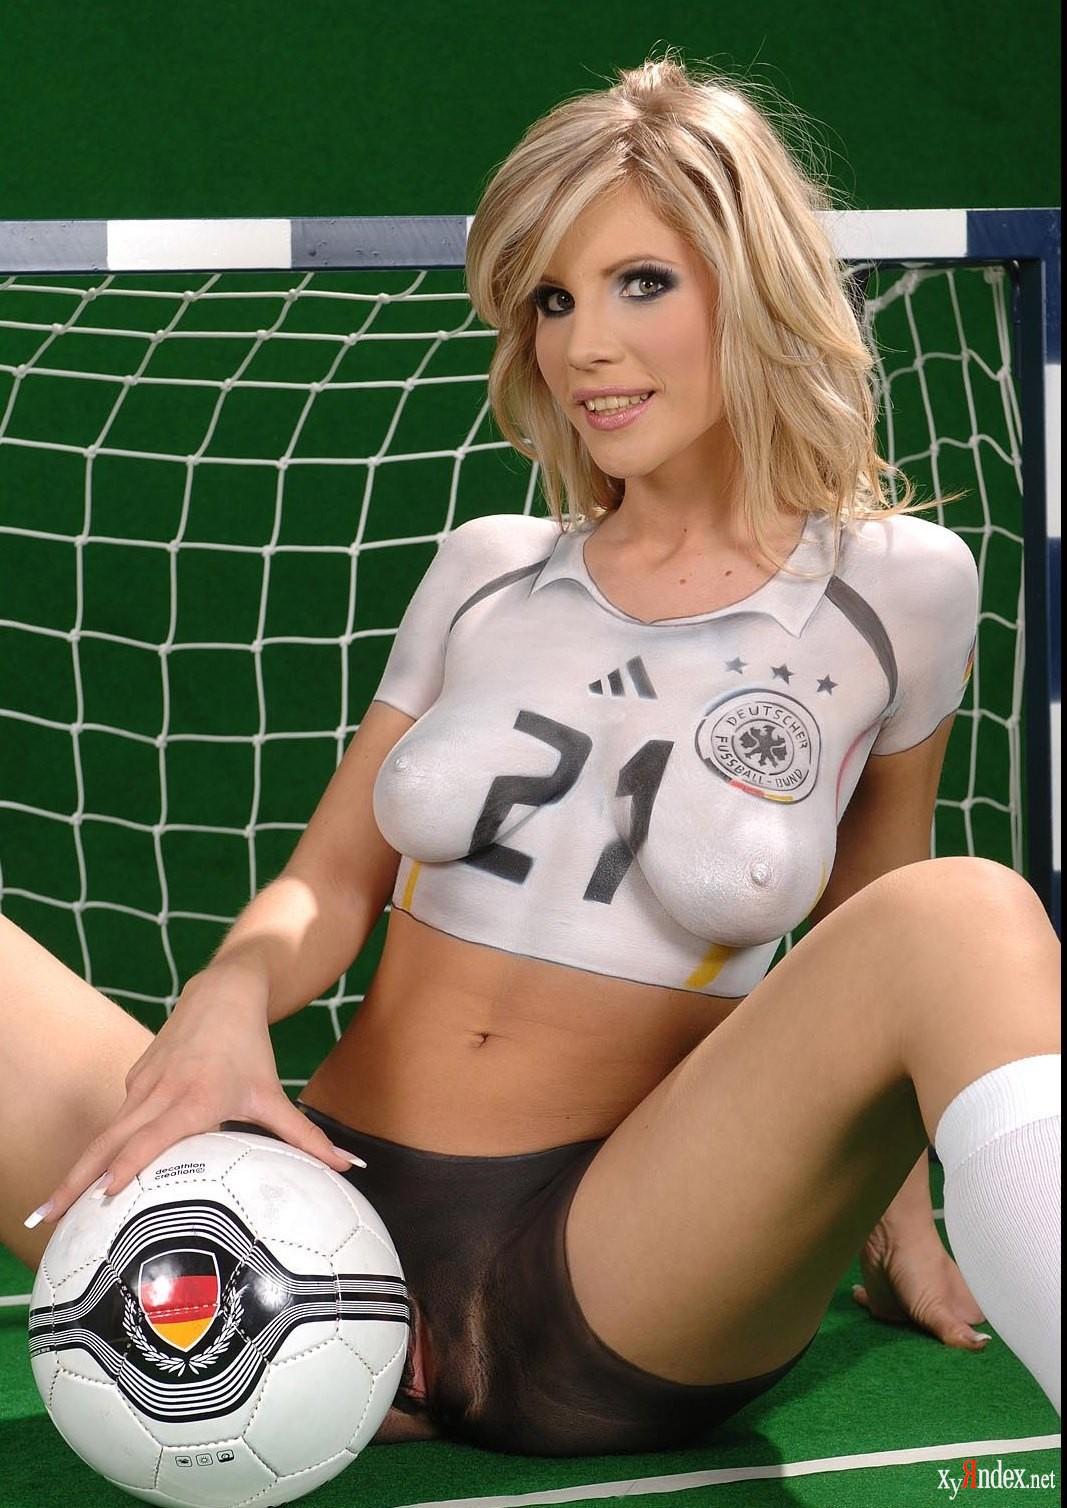 A nude girl playing football